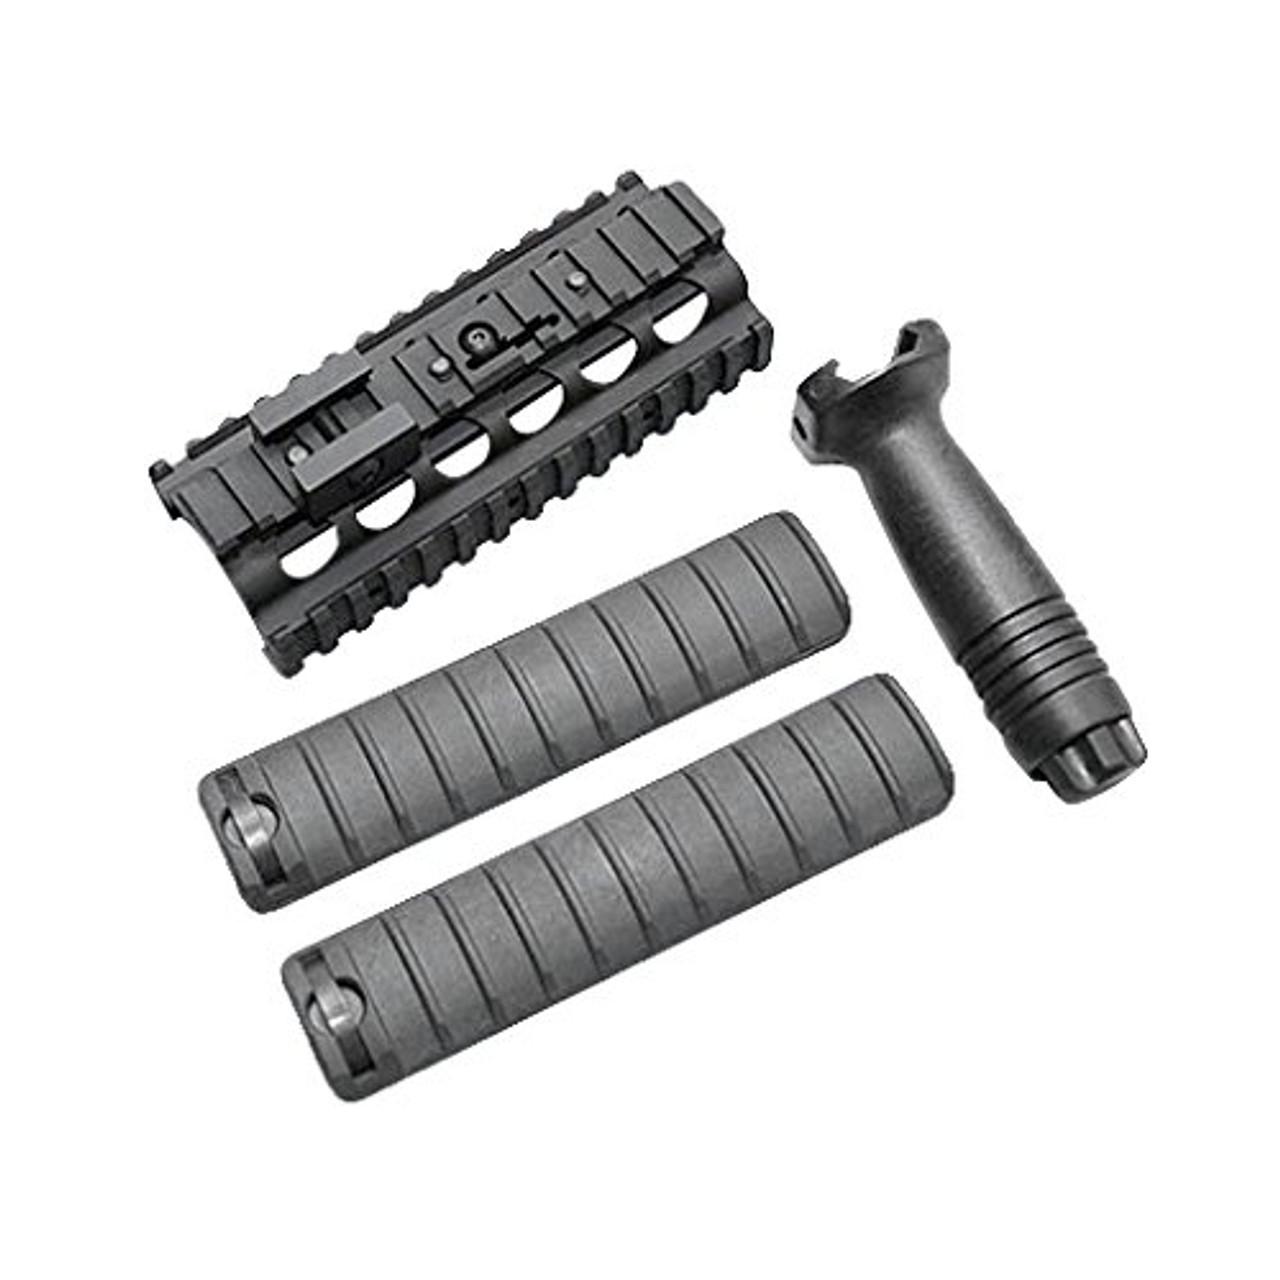 G&P M249 RAS Kit for TOP M249 Series